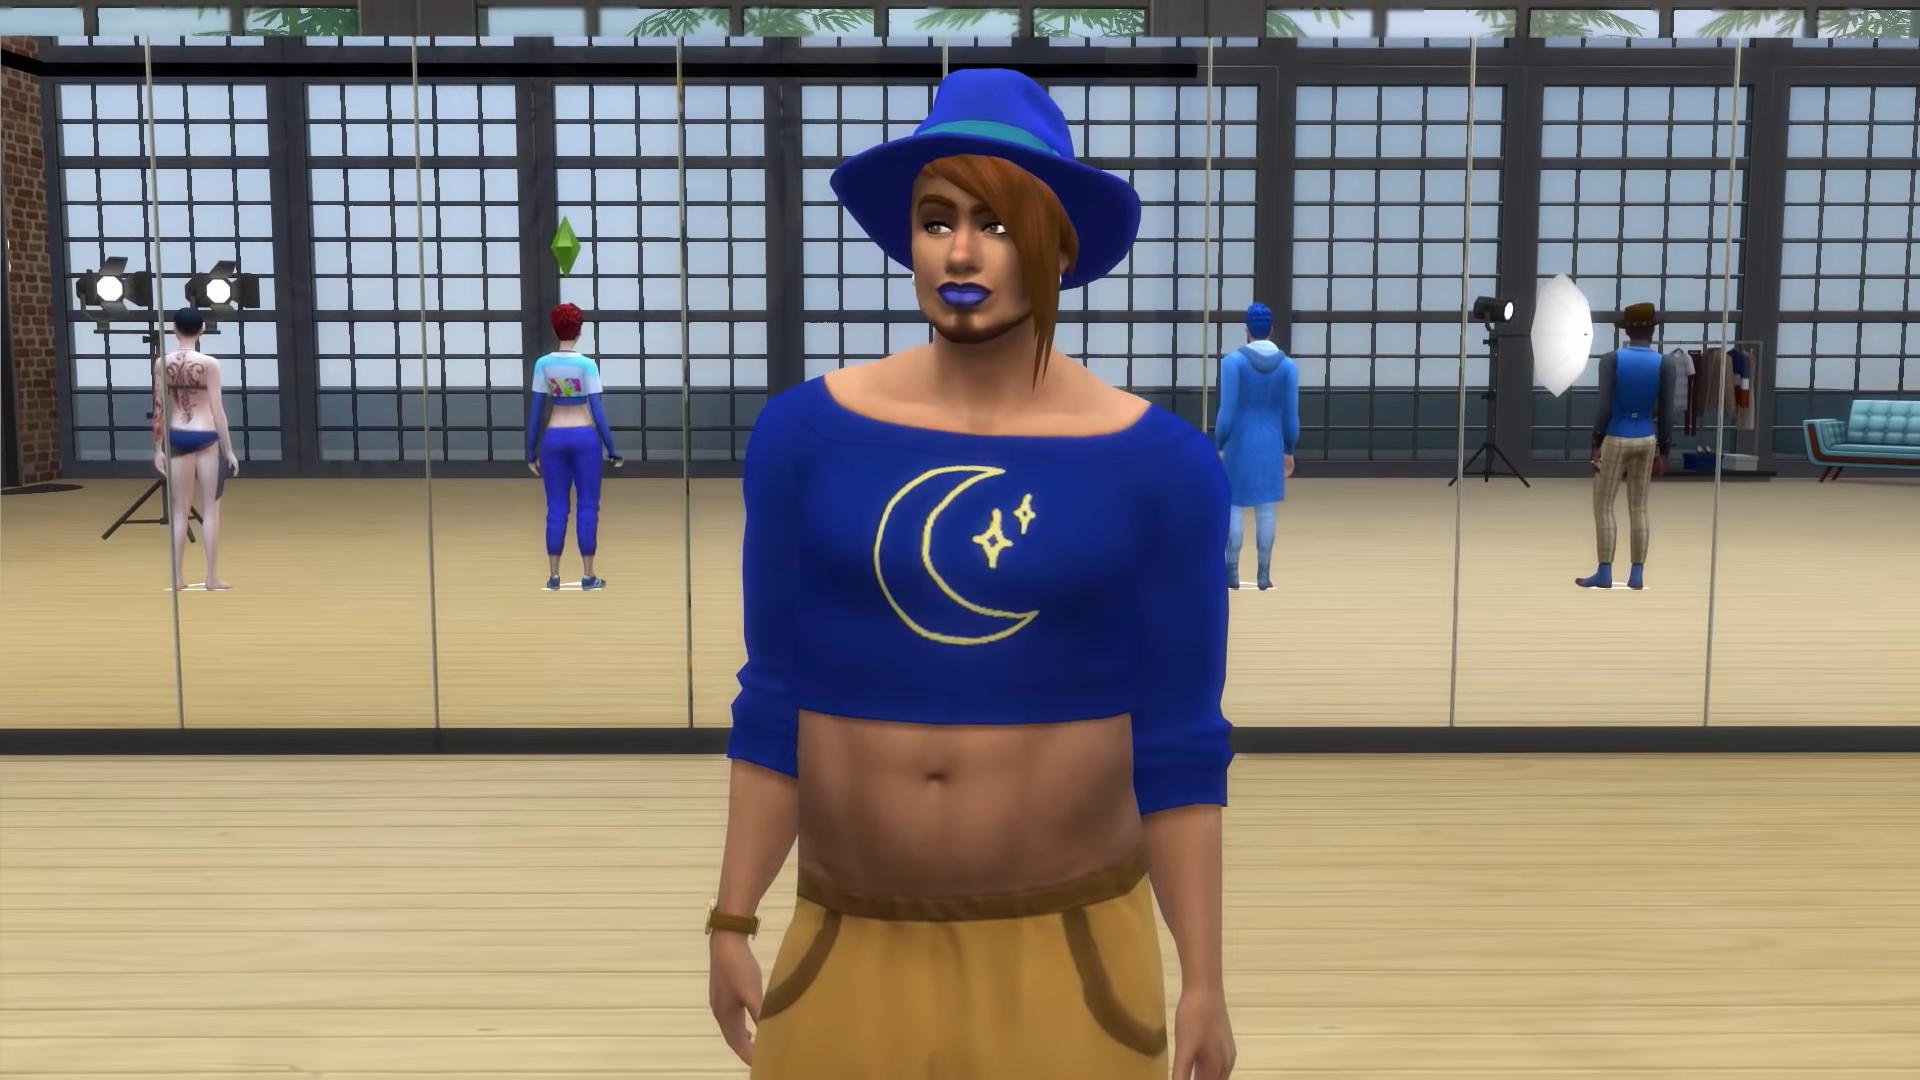 Les Sims Spark'd Screenshot-2020-08-03-174022